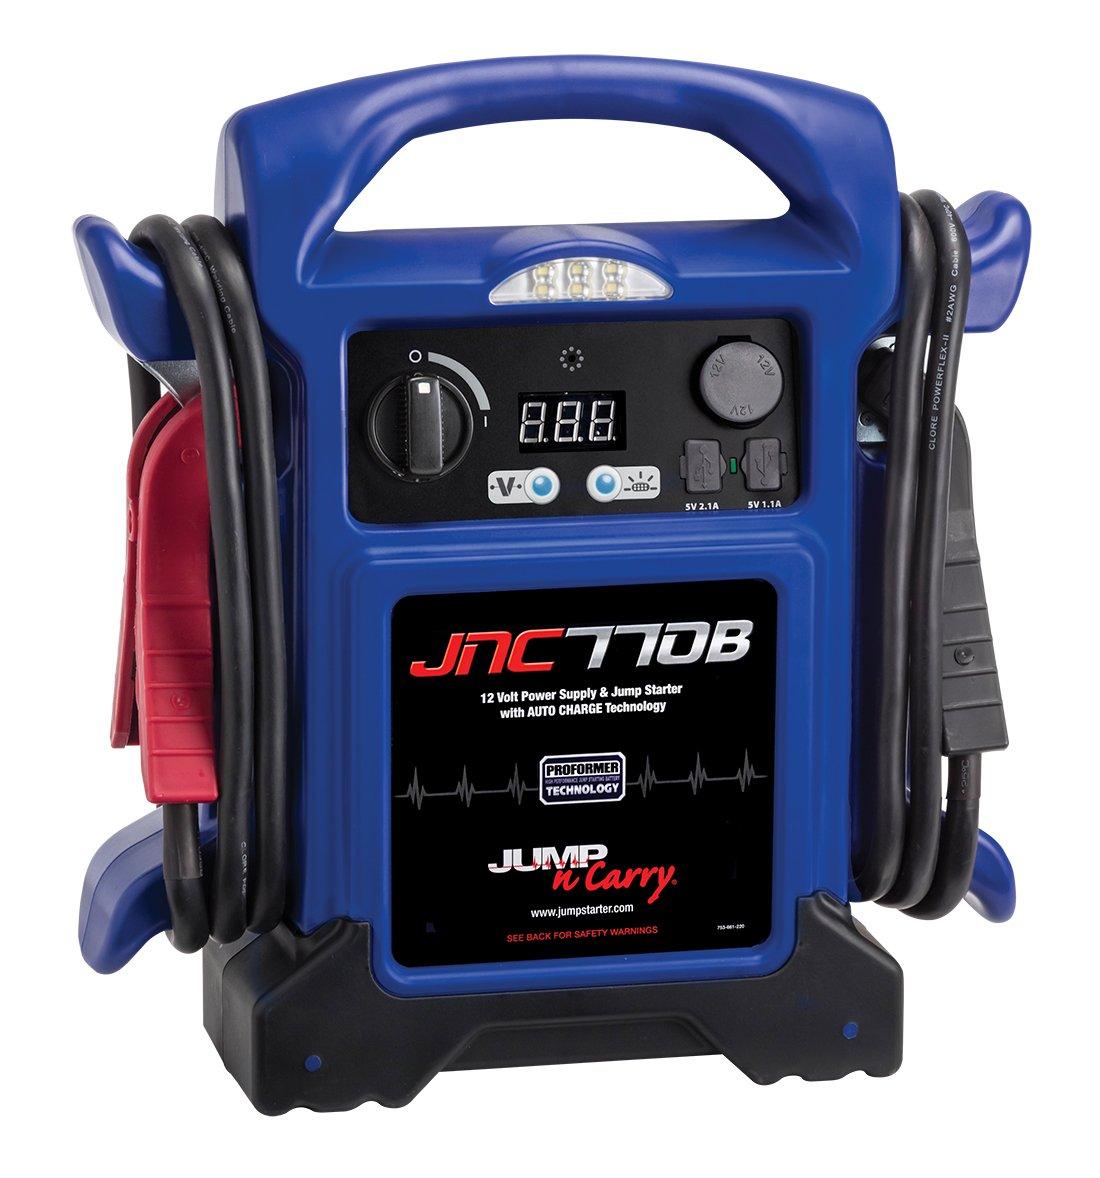 Jump-N-Carry JNC770B 1700 Peak Amp Premium 12V Jump Starter - Blue